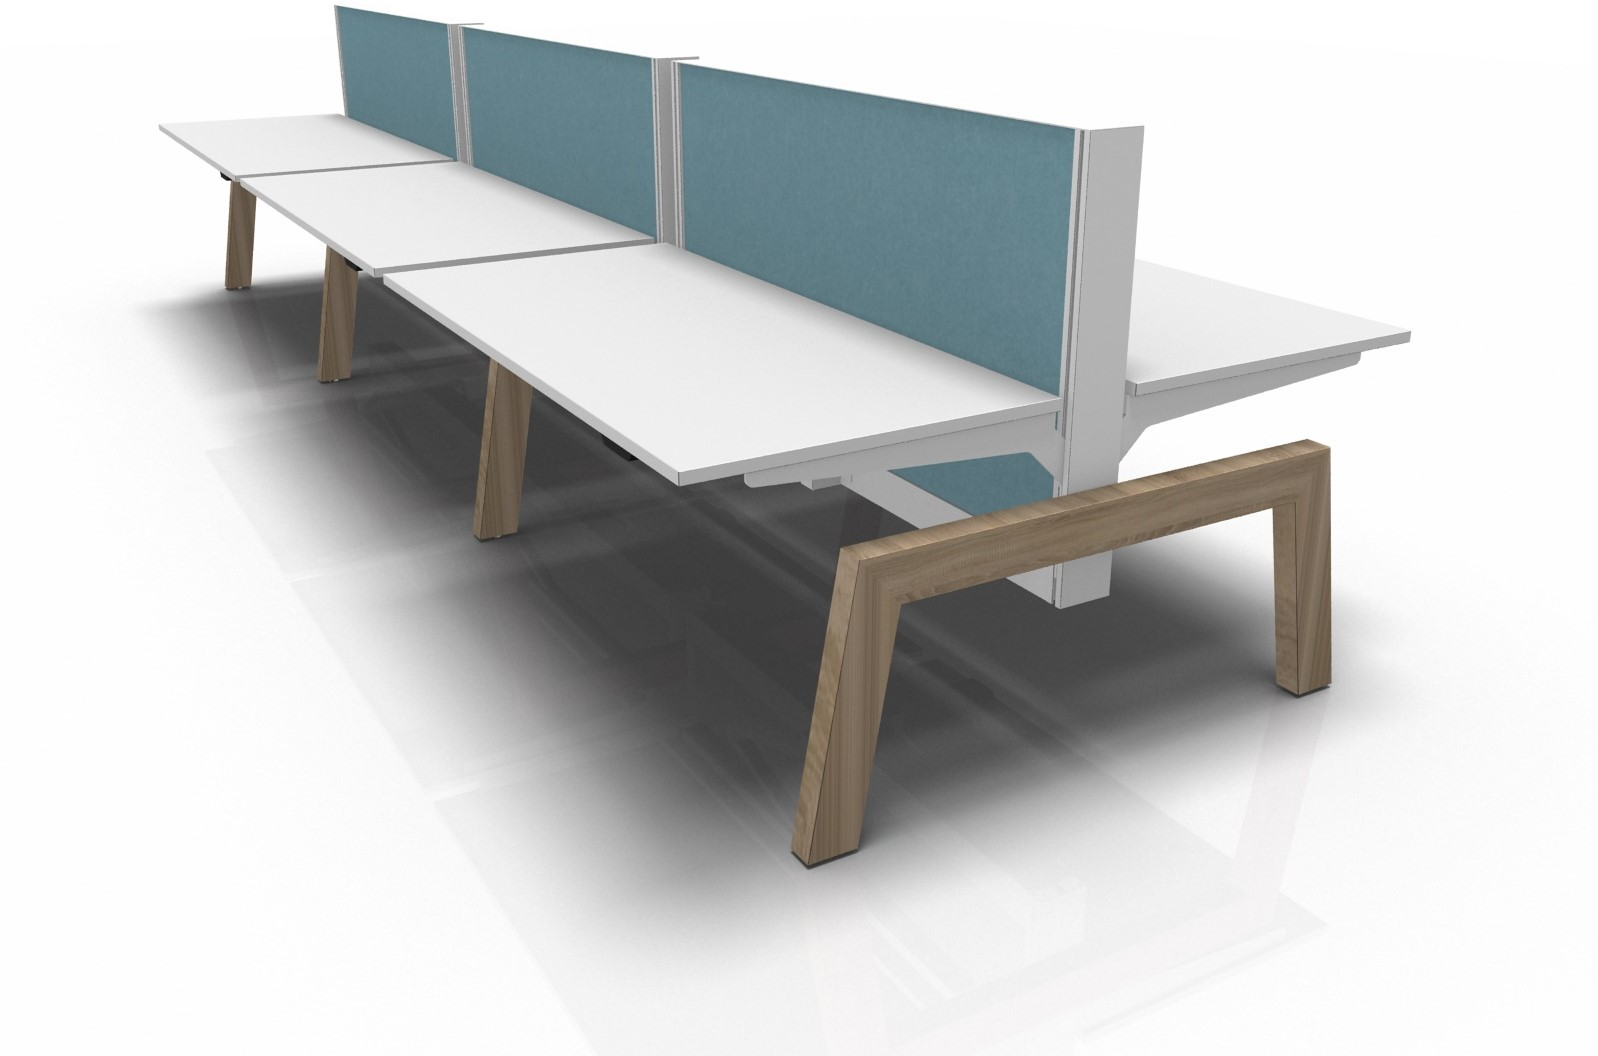 Terrific Markant Max Hybrid Bench Bureau 4 Werkplekken 160X80Cm Bralicious Painted Fabric Chair Ideas Braliciousco